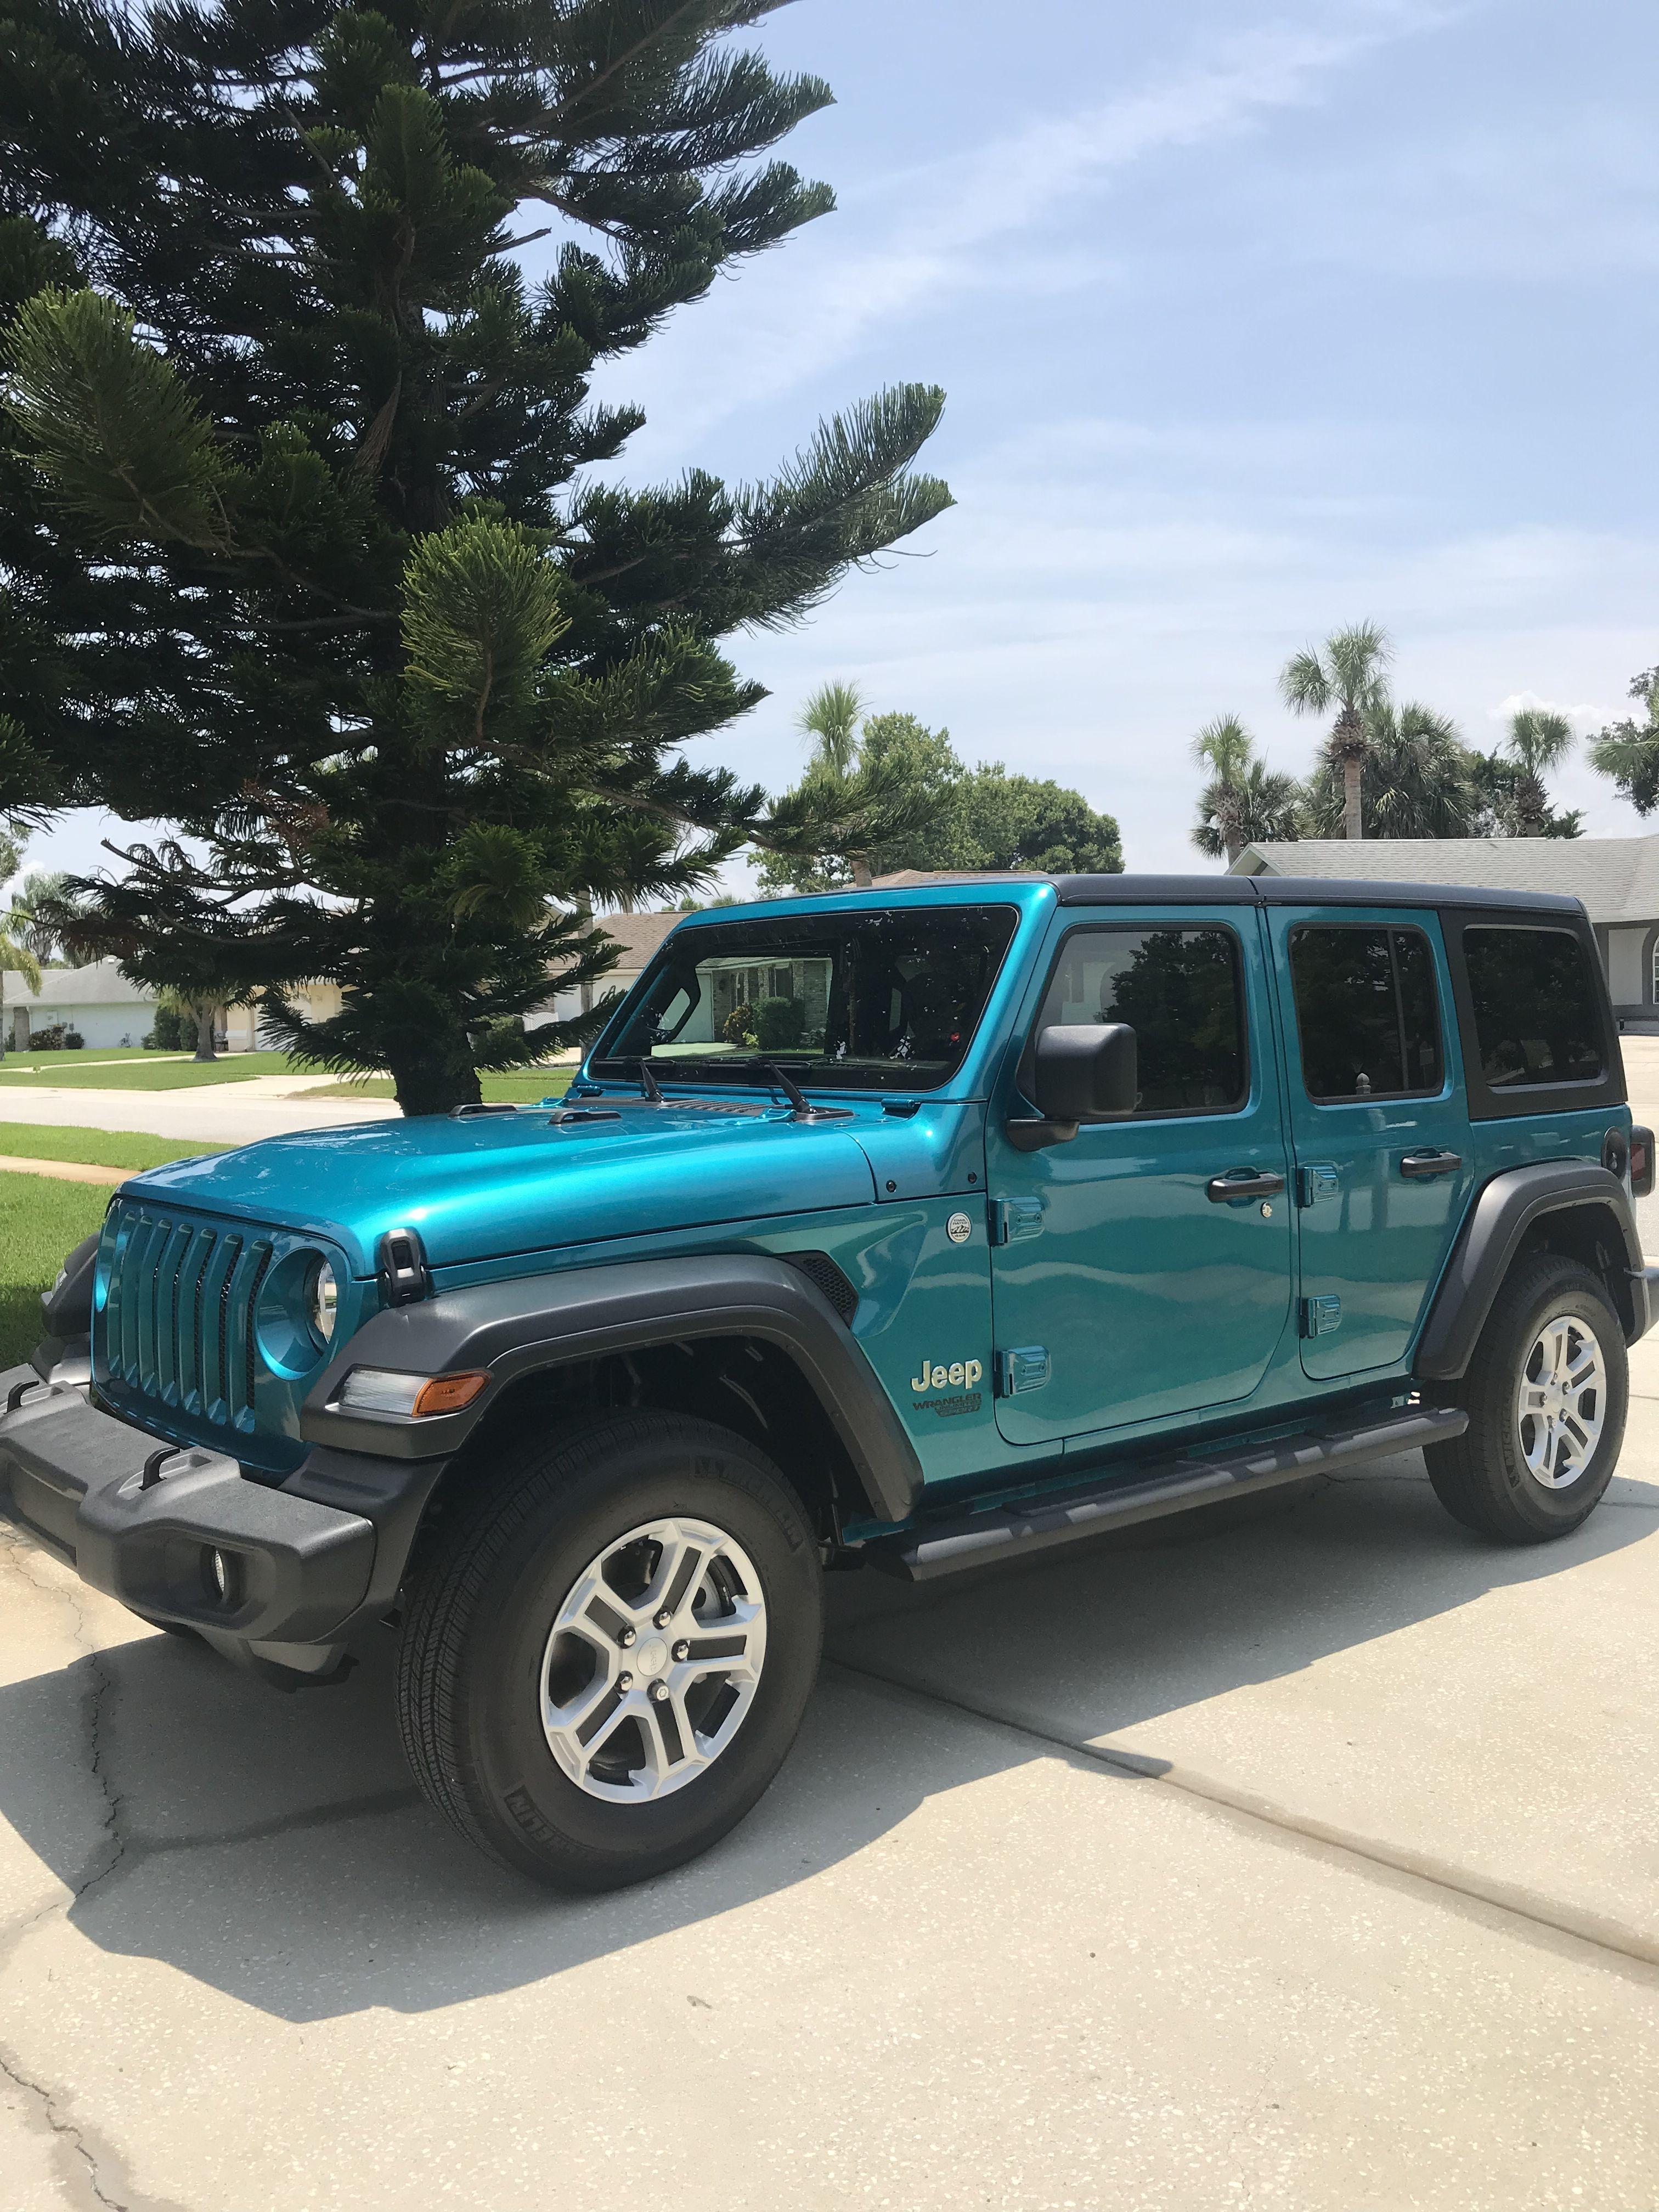 Pin By Keelia On Jeeps In 2020 Blue Jeep Wrangler Jeep Wrangler Sahara Blue Jeep